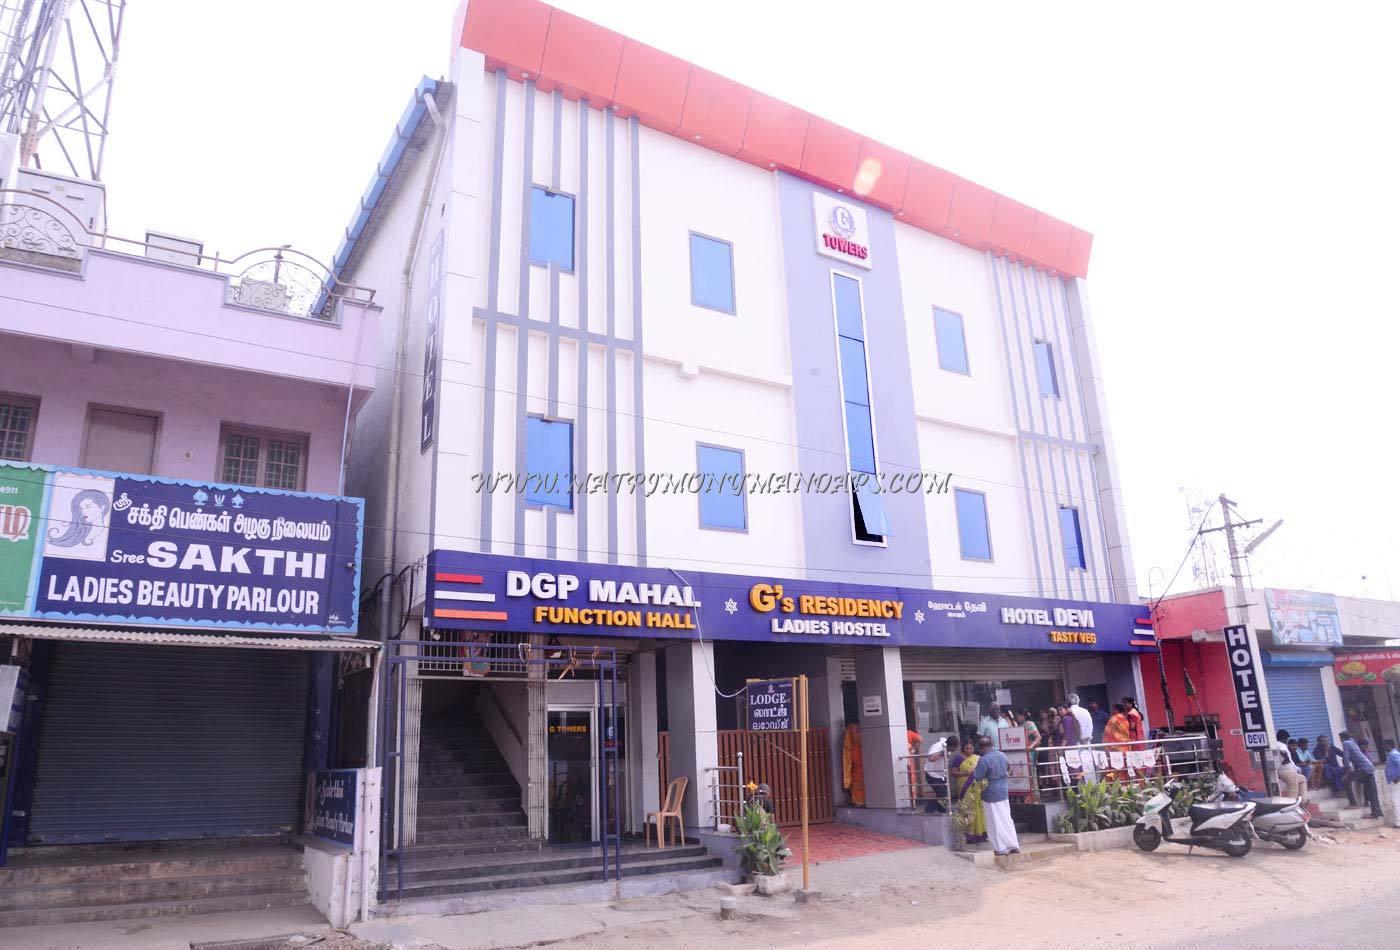 Find More Kalyana Mandapams in Eachanari